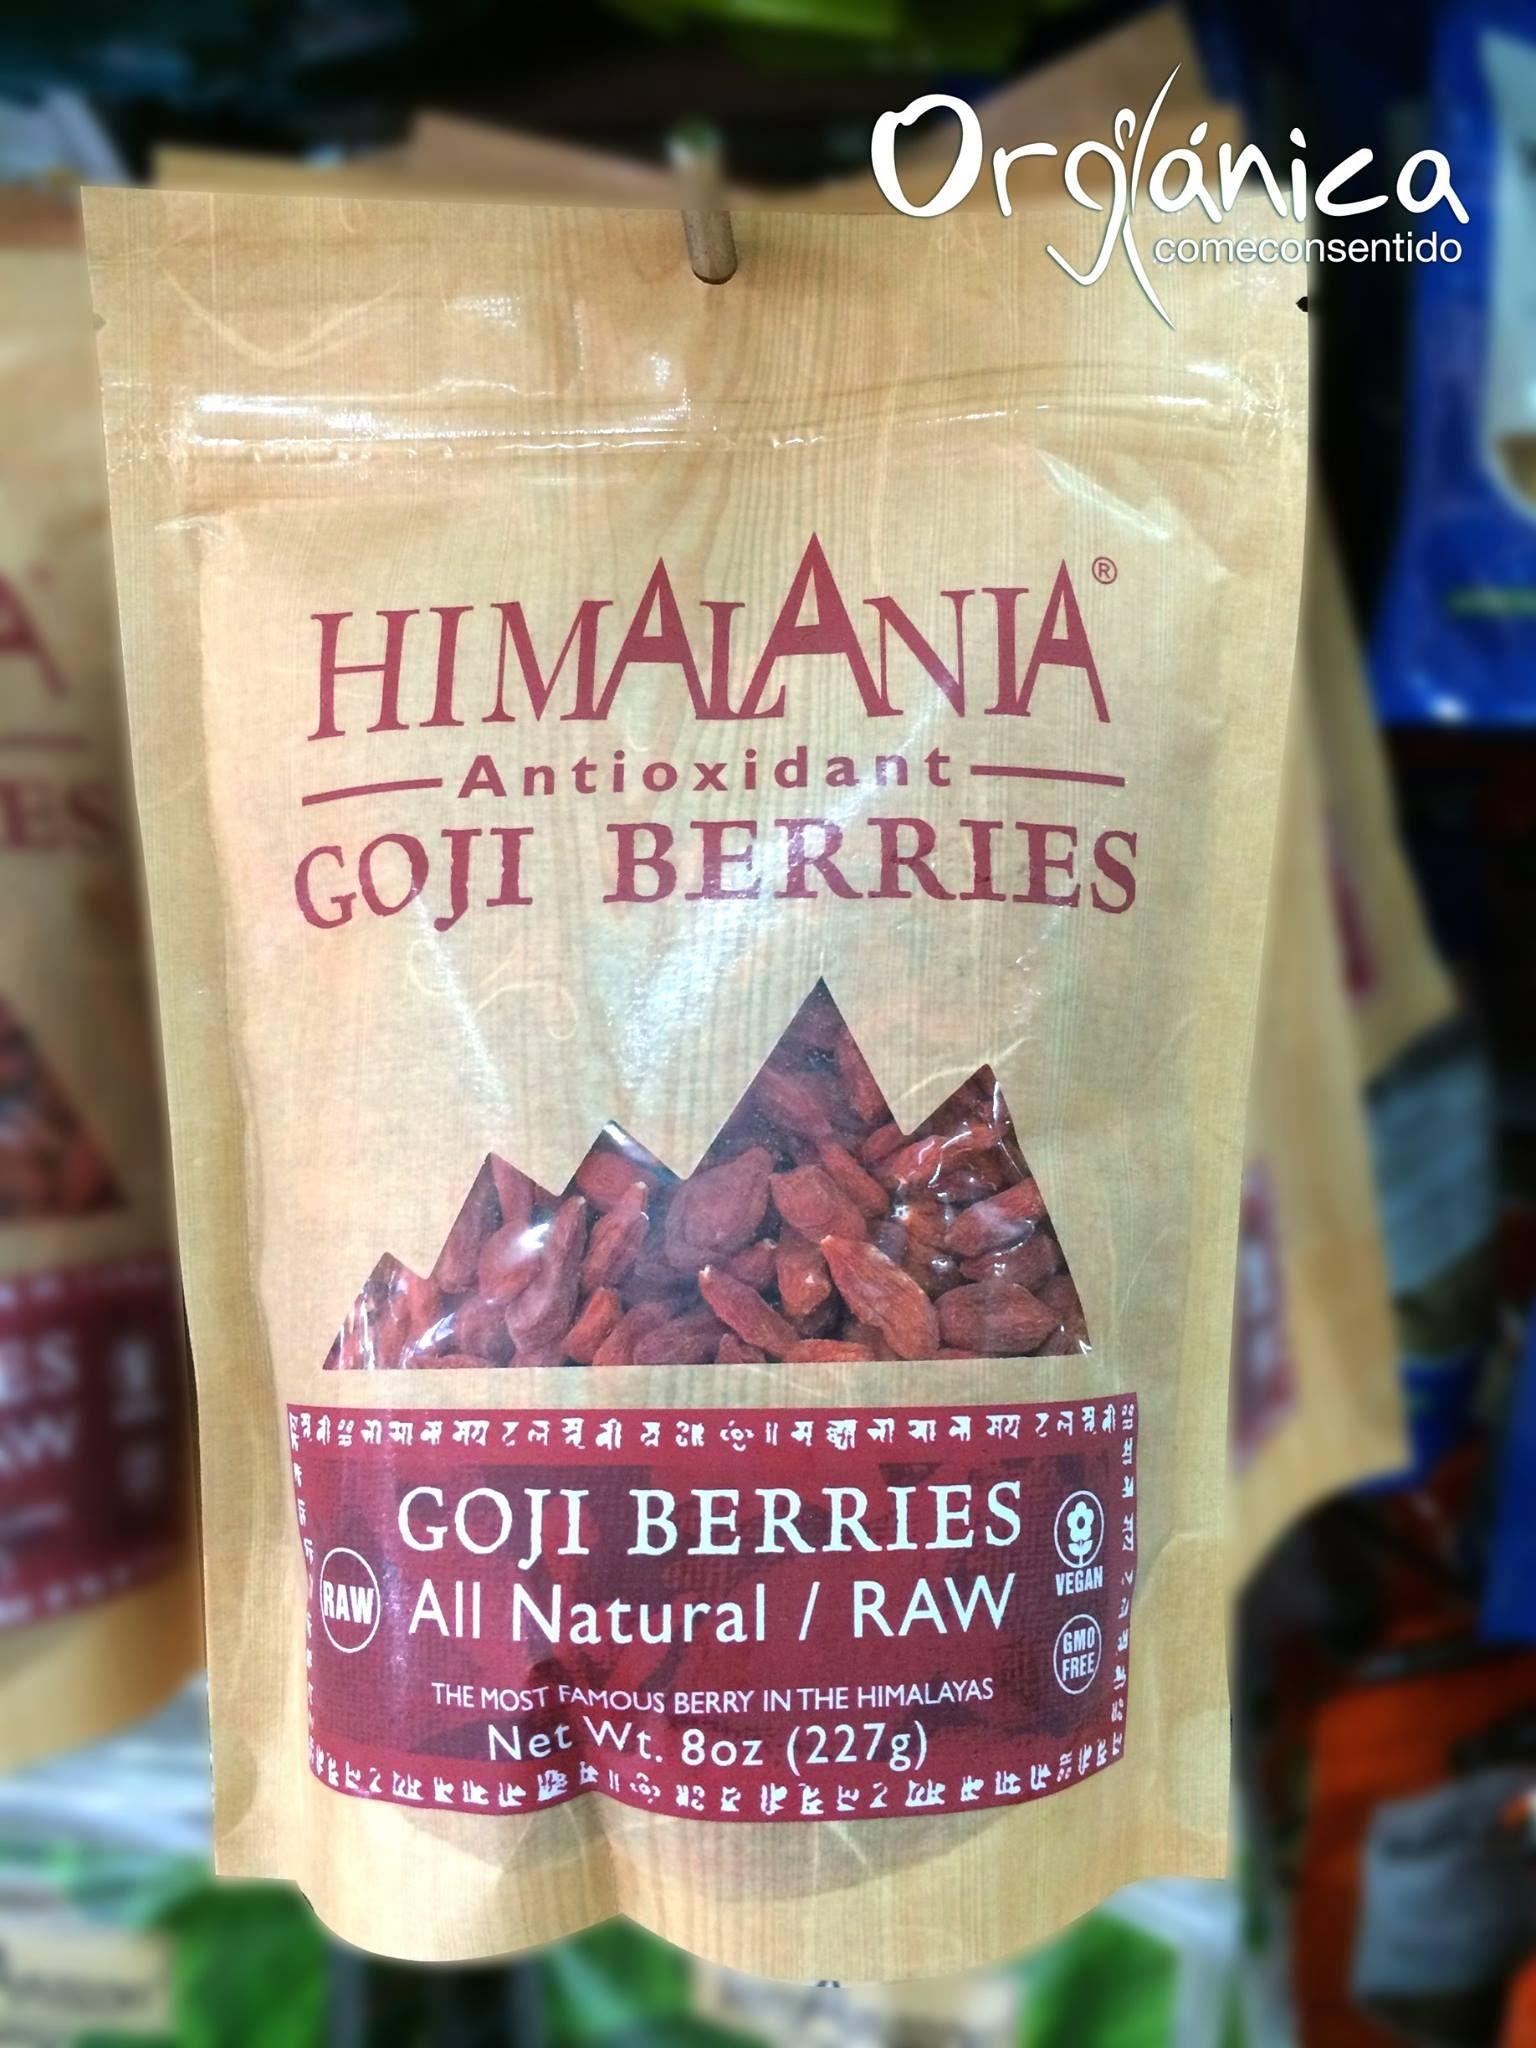 Deliciosas berries  naturales.